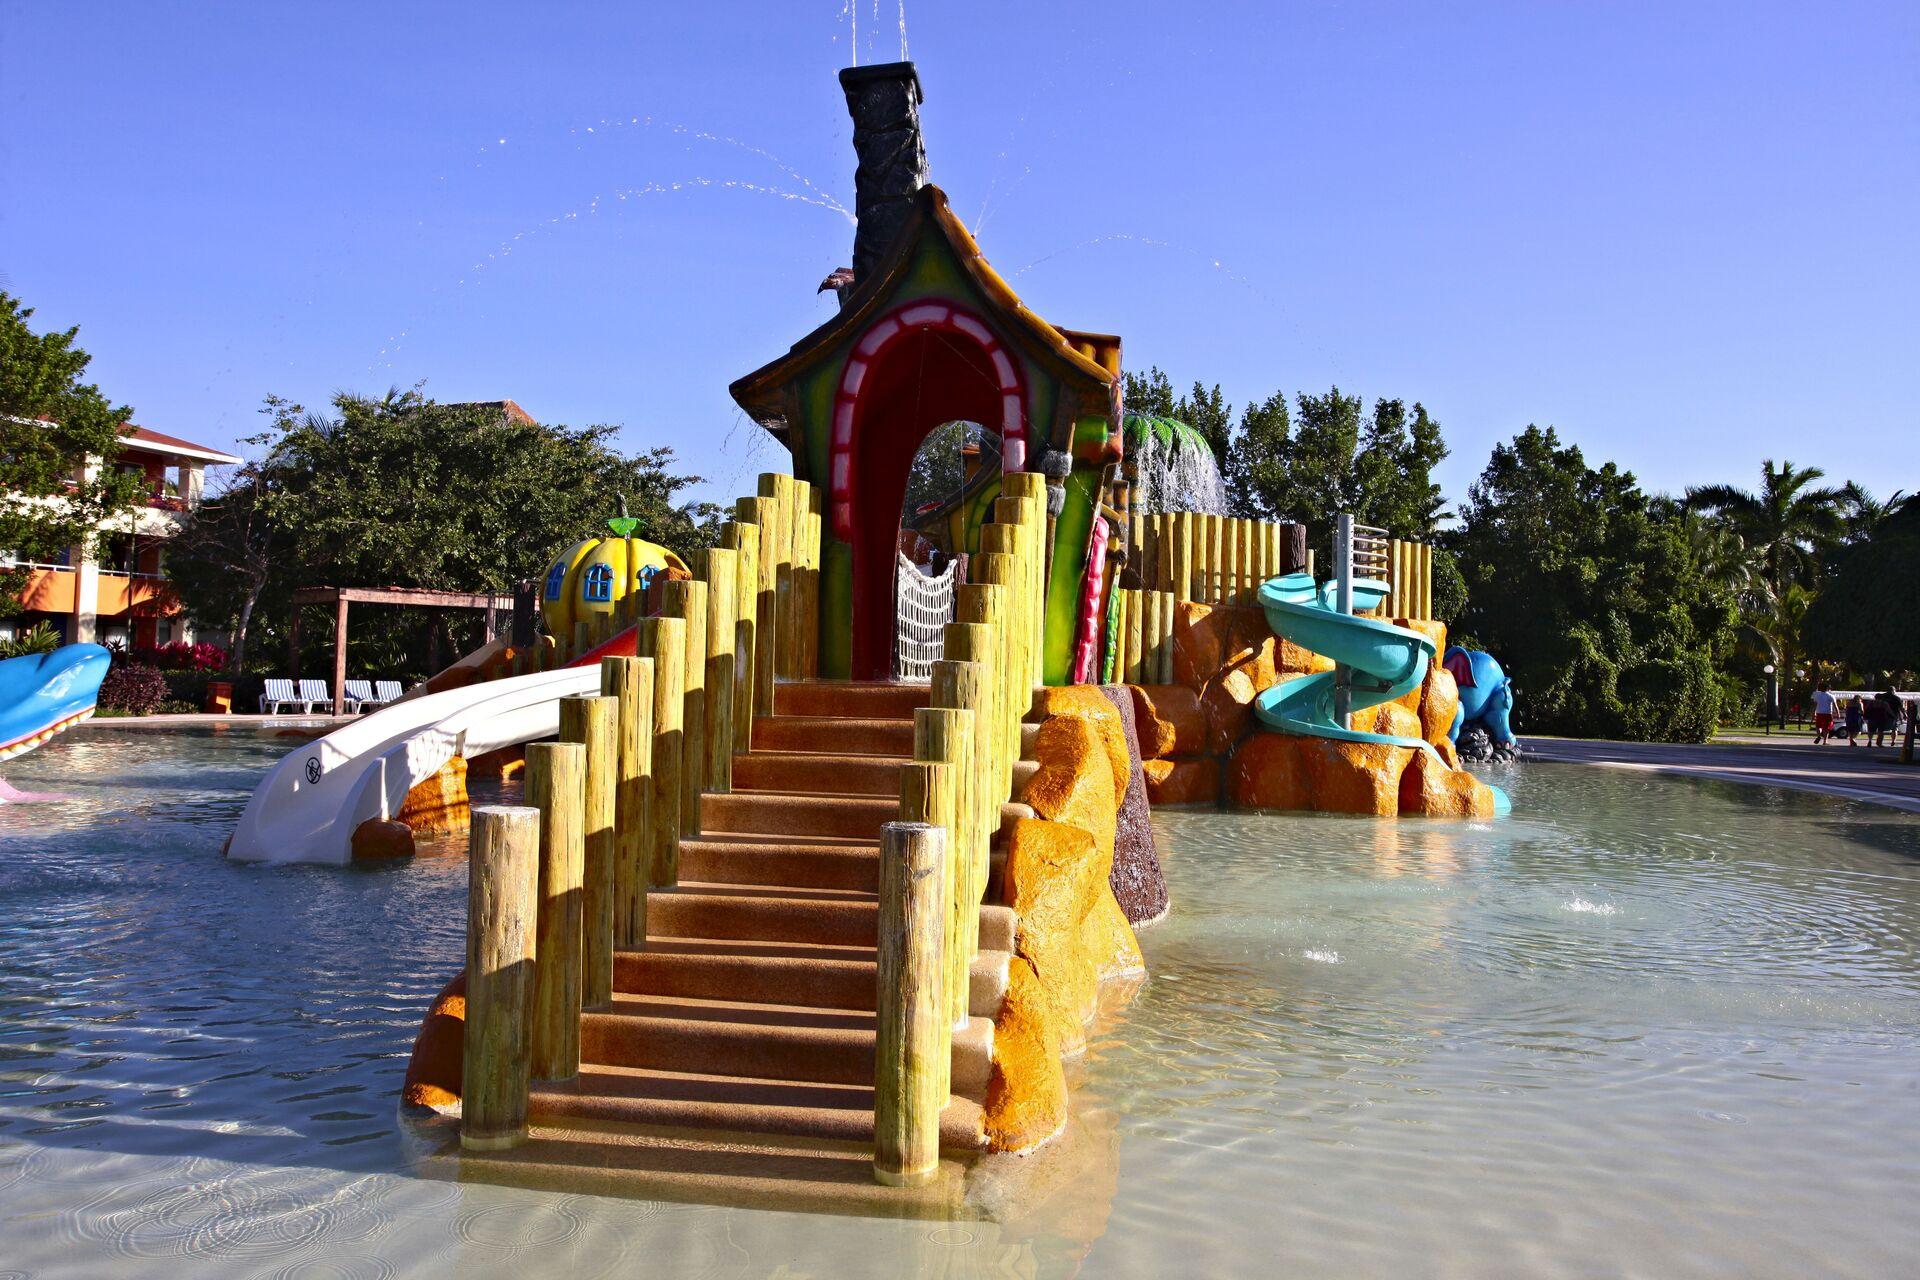 https://cms.satur.sk/data/imgs/tour_image/orig/gbpcob_mex_pool_waterpark_007-2013602.jpg